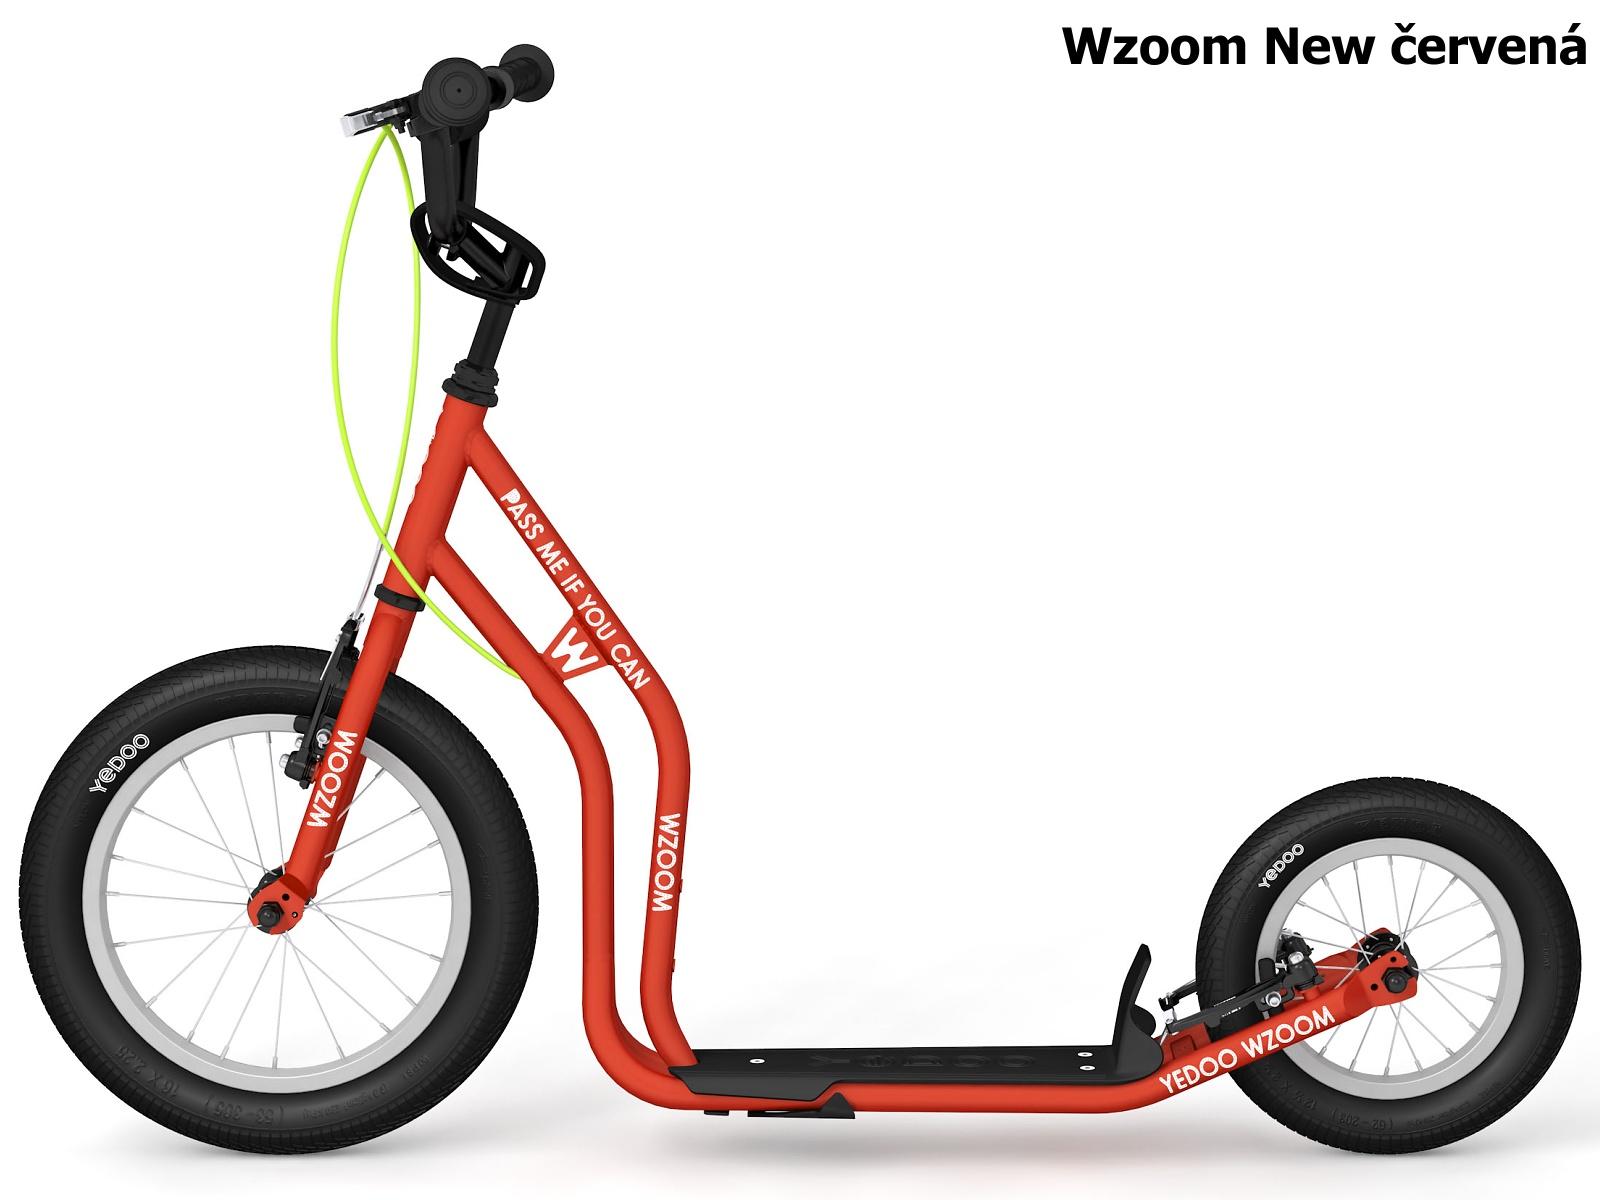 Koloběžka YEDOO Wzoom New 16-12 červená